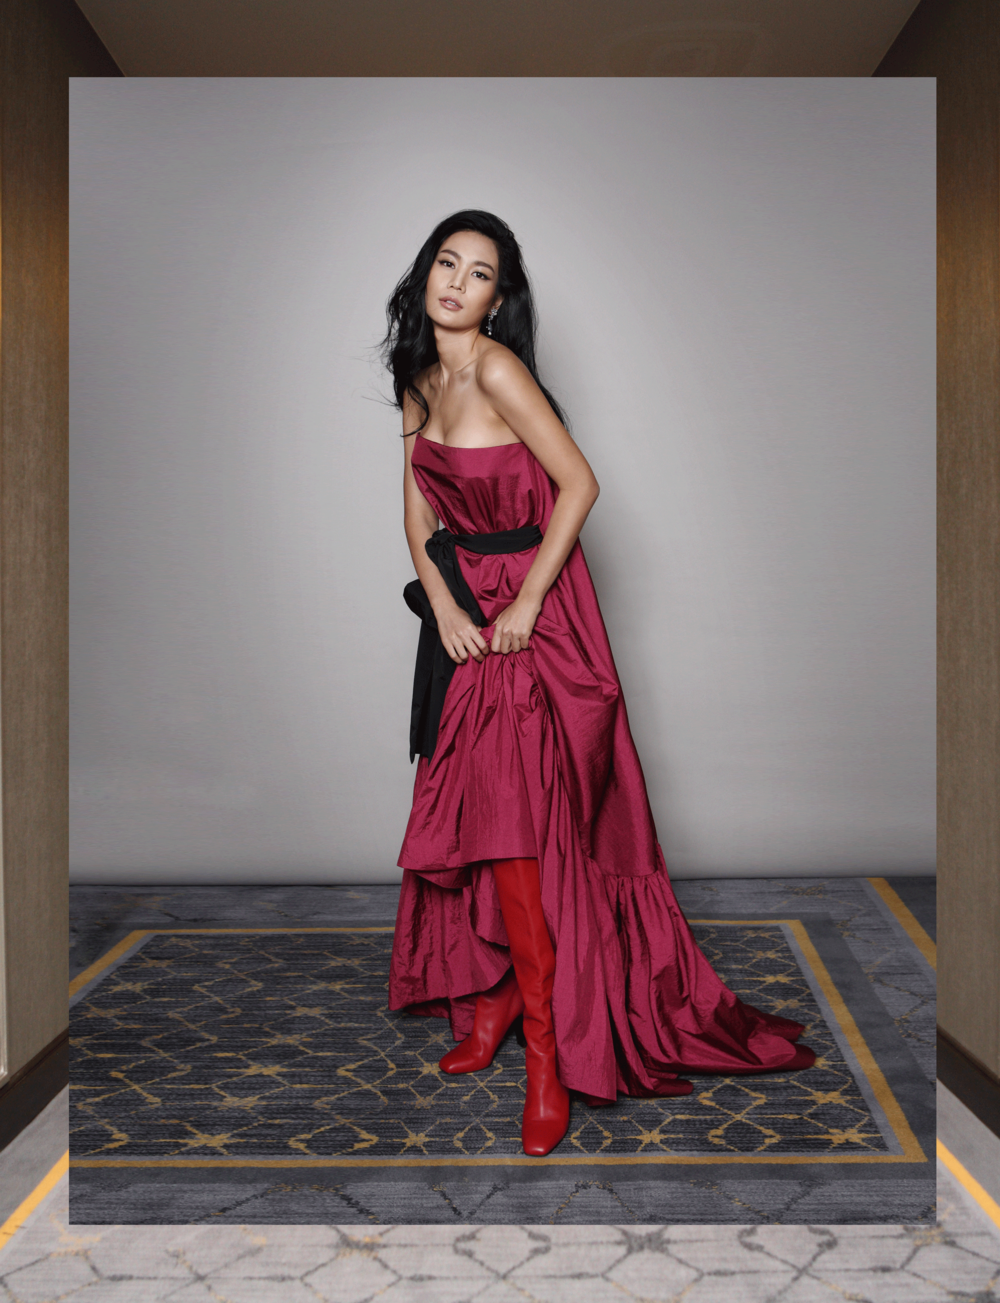 dress : ASAVA / boots : Salvatore Ferragamo / earrings : 77th